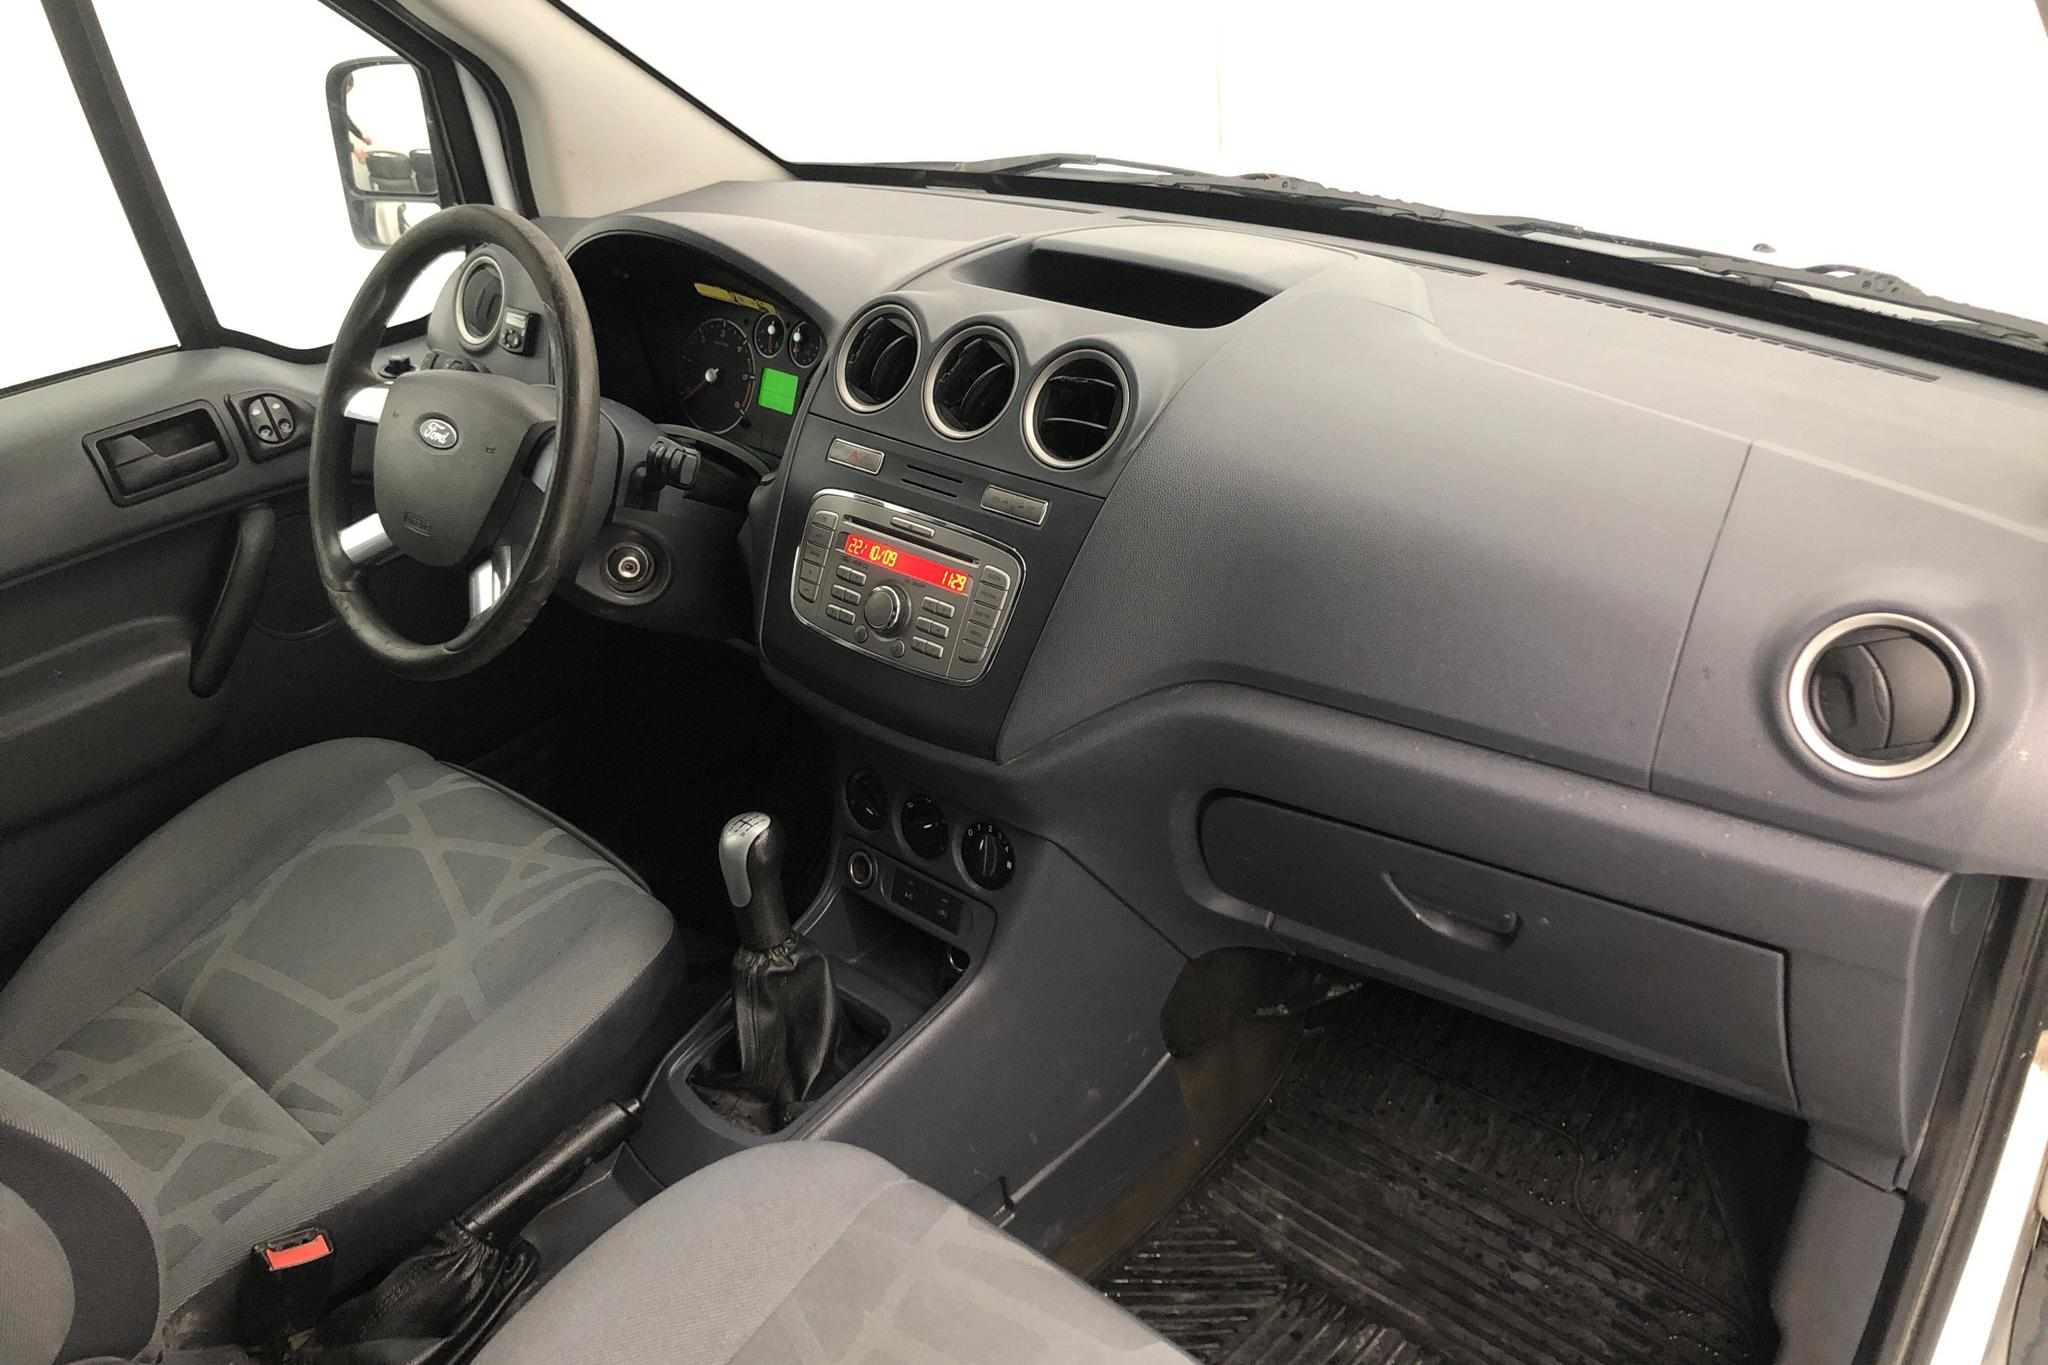 Ford Transit Connect 1.8 TDCi (110hk) - 159 150 km - Manual - white - 2009